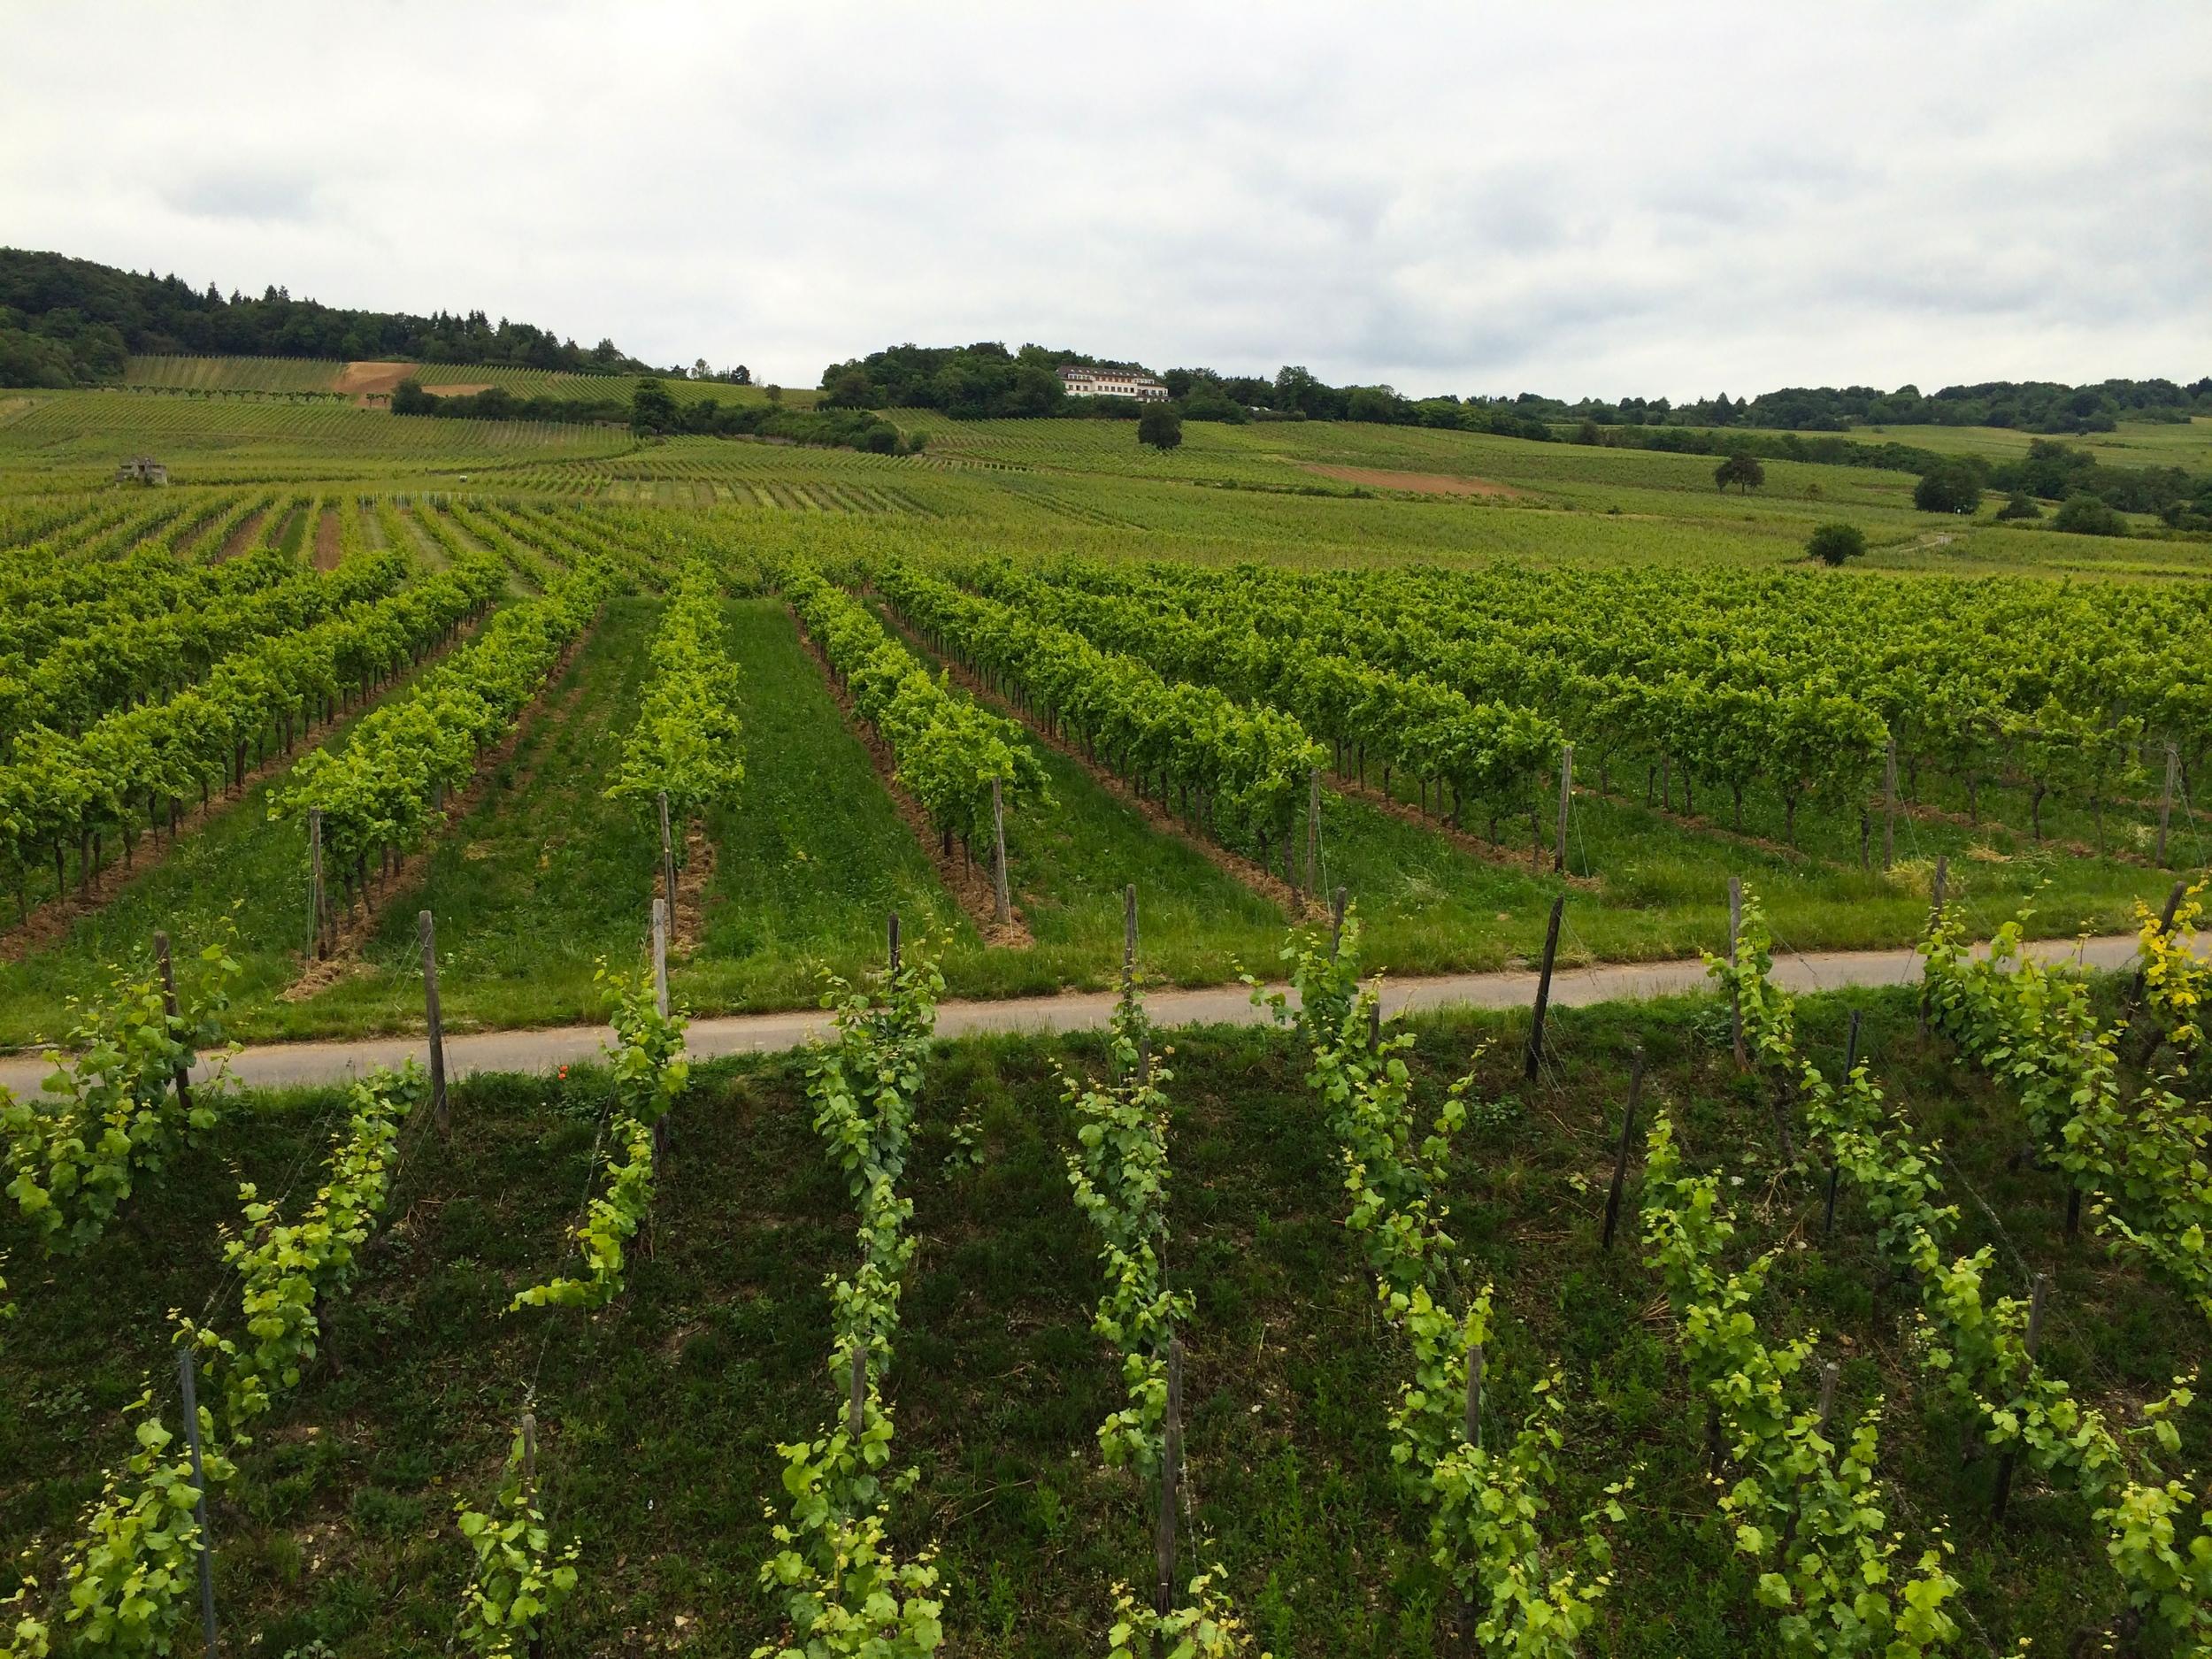 Vineyards in Rüdesheim am Rhein directly off the Rhine river